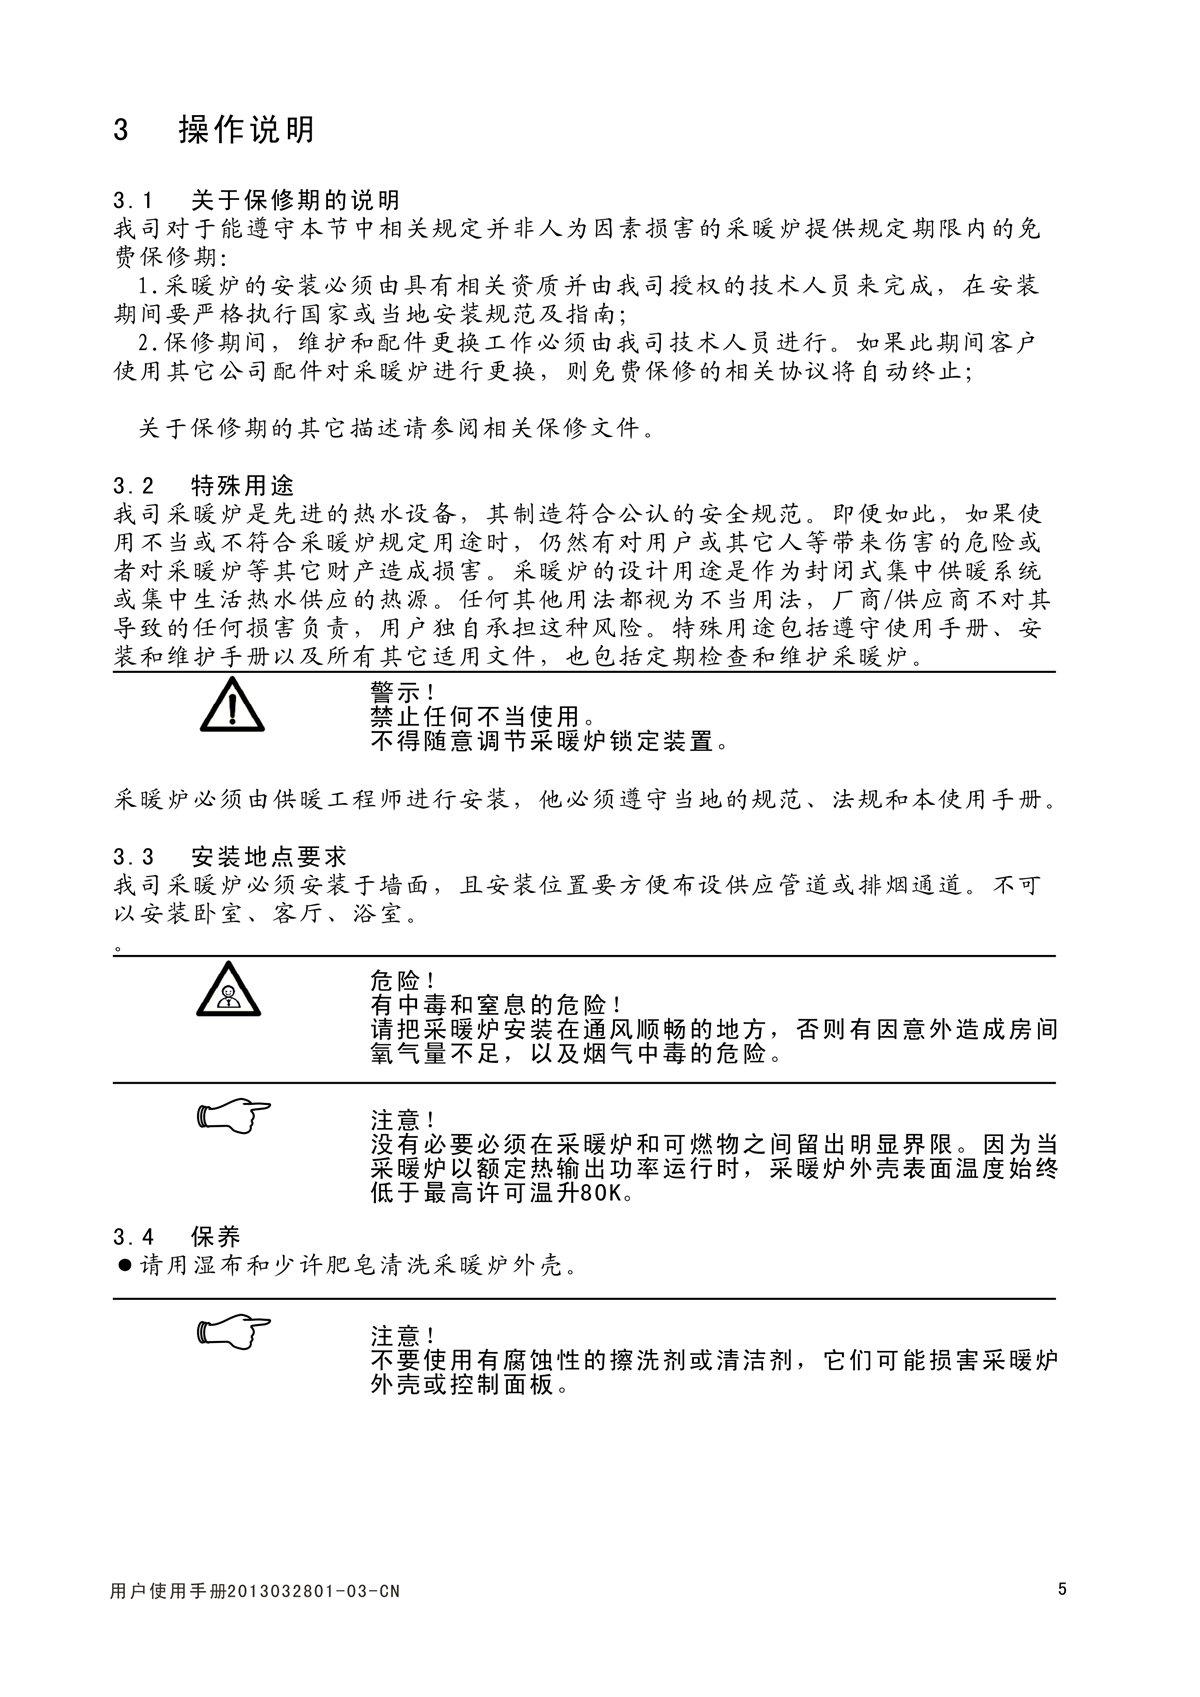 ES02系列-用户使用手册-6_02.jpg